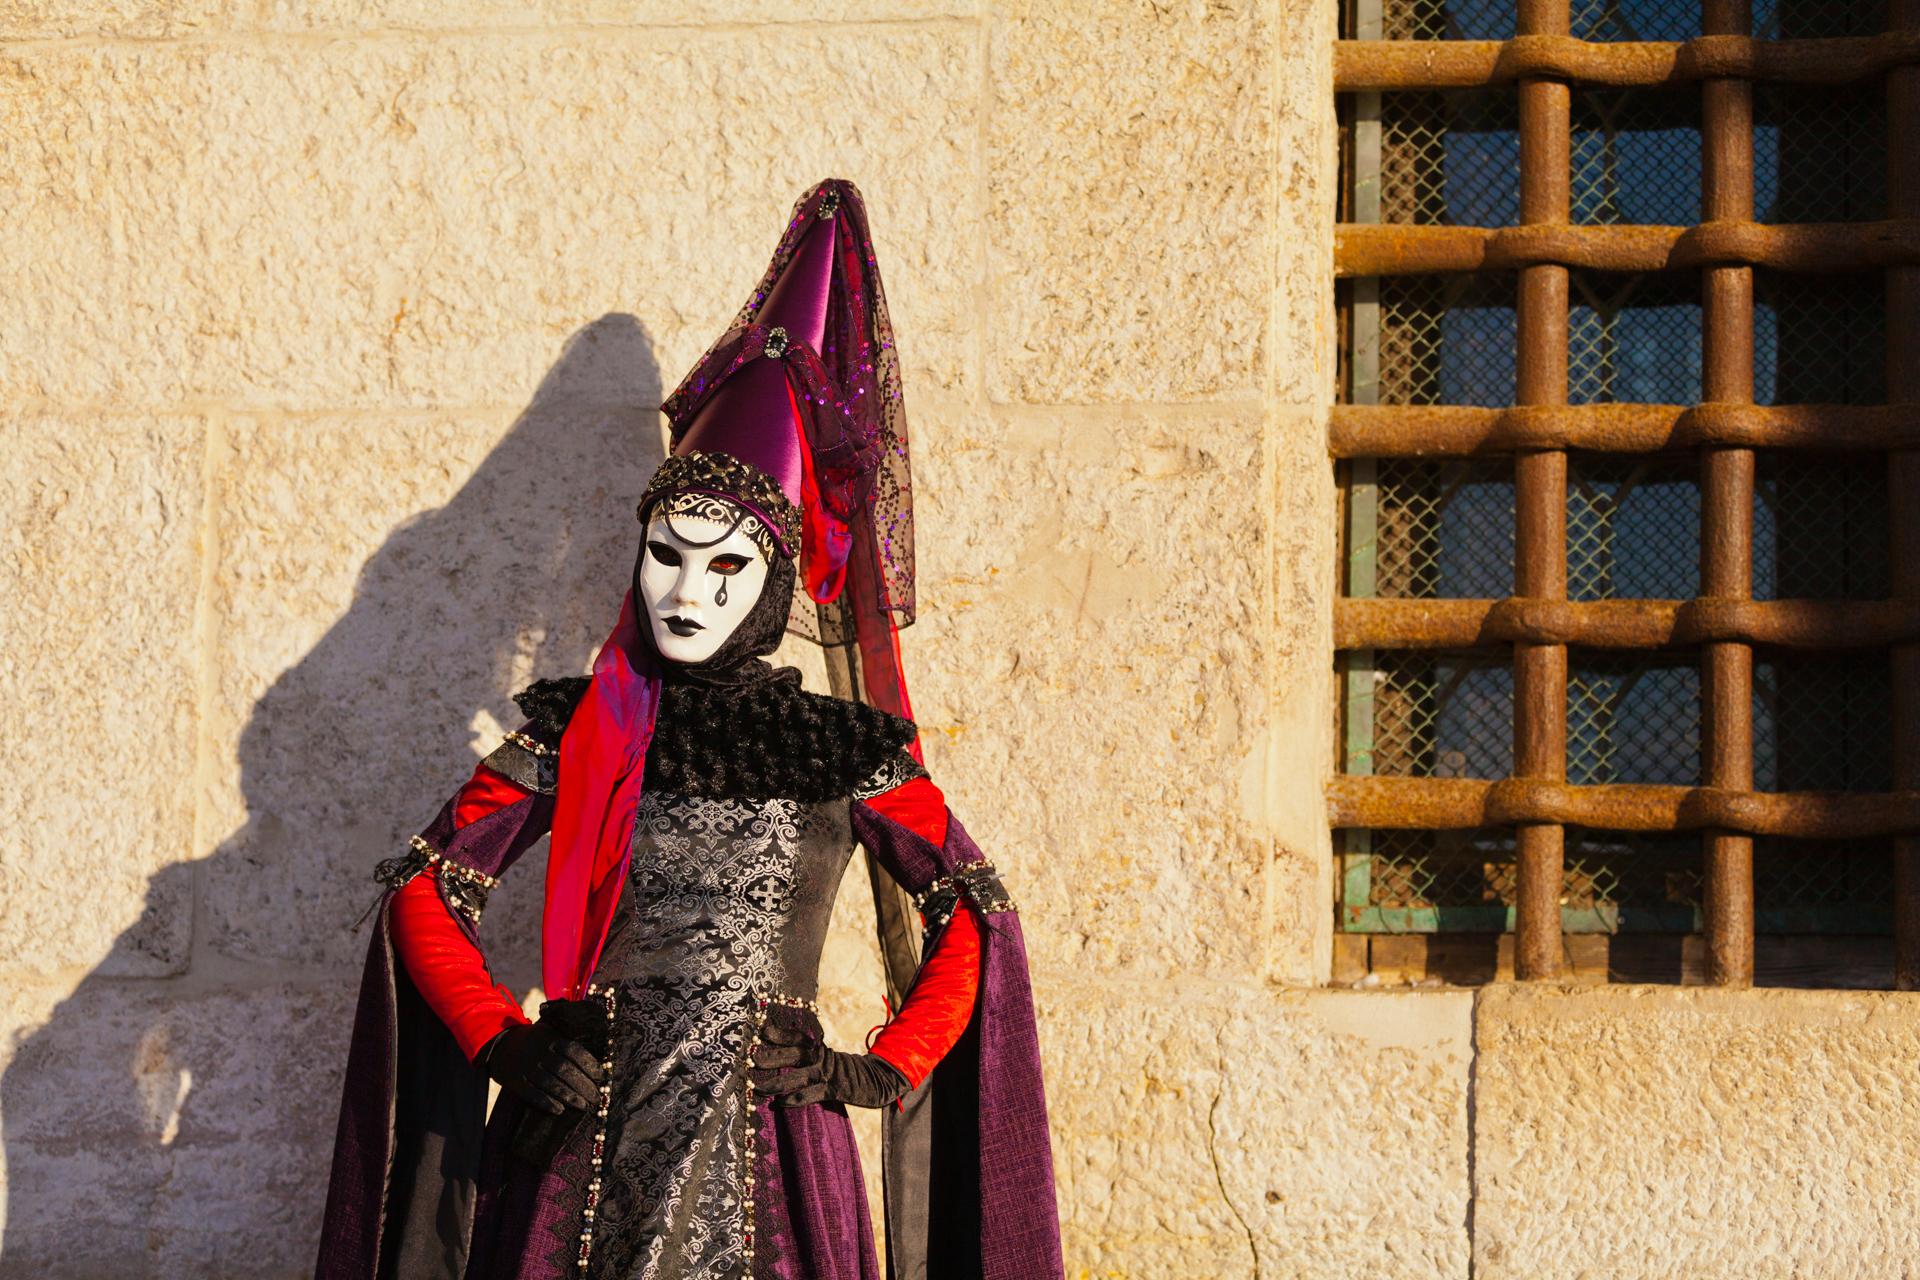 Portrait of reveler at Venice carnival